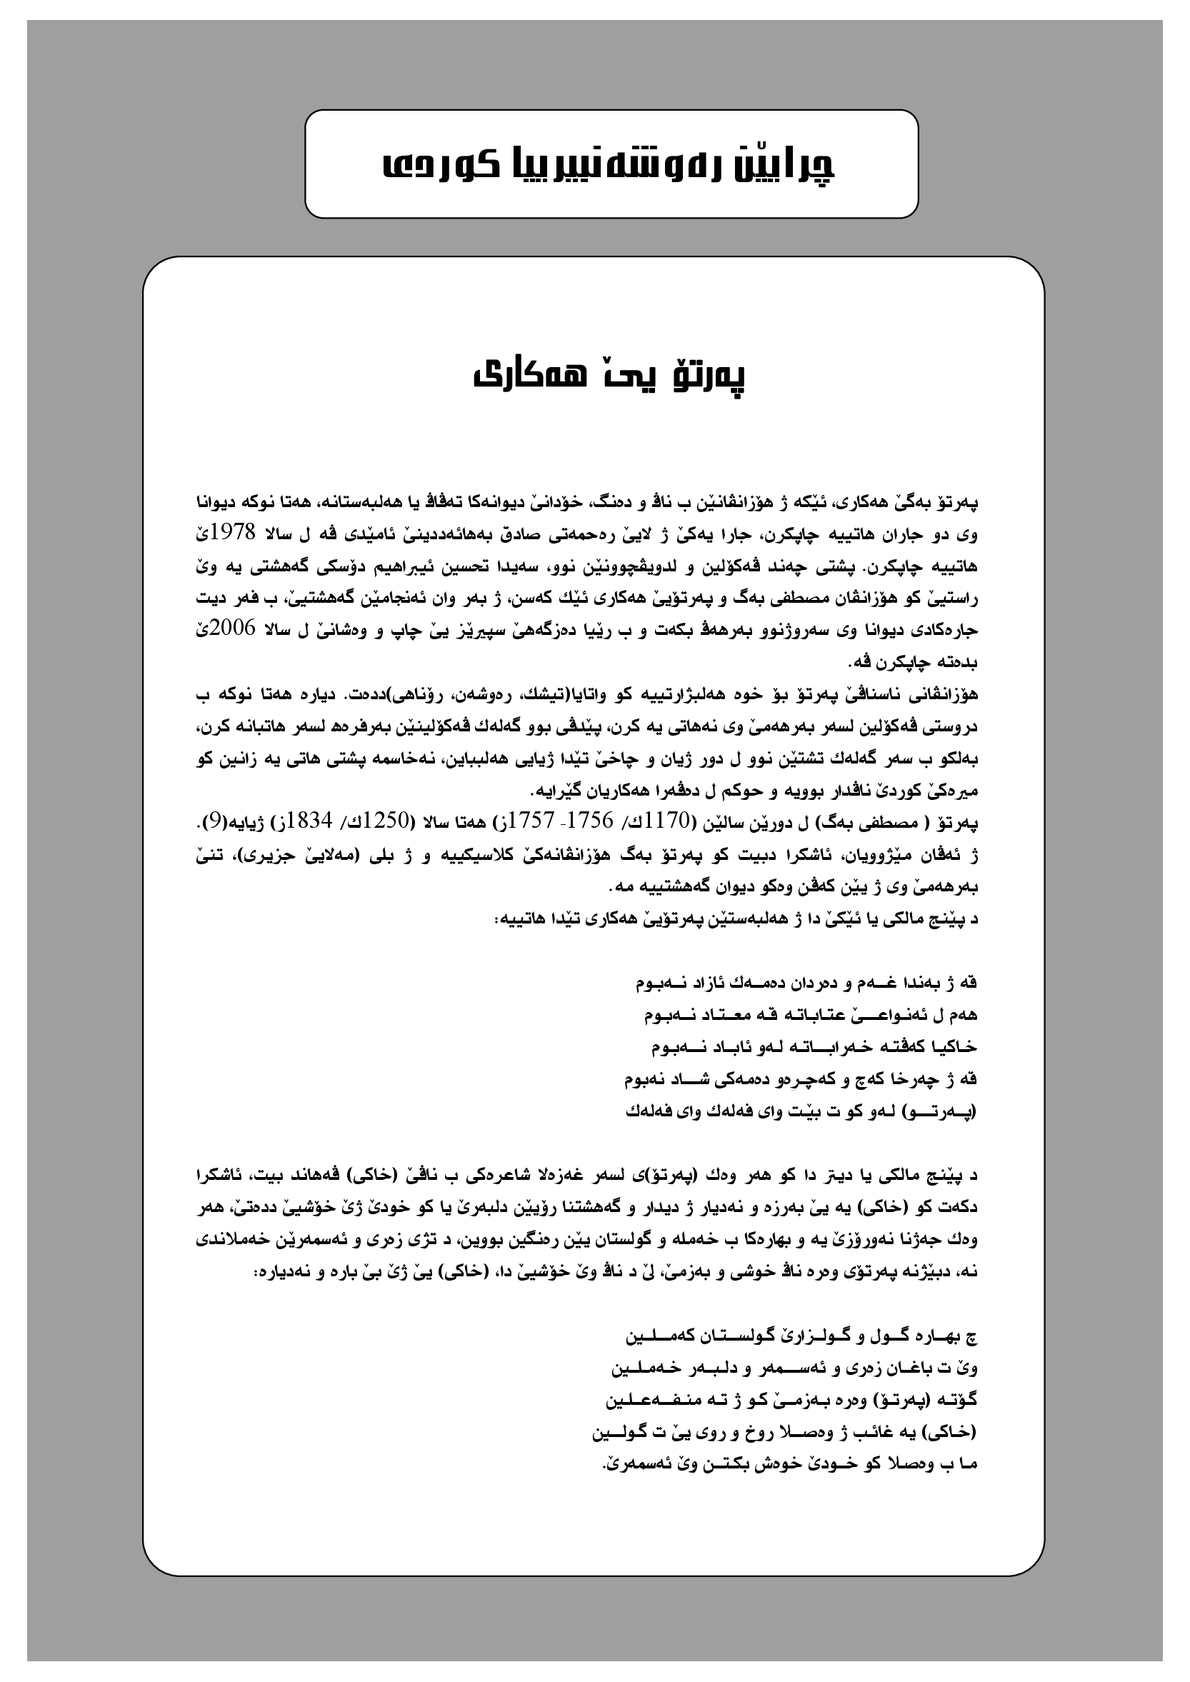 kovara peyv 66-2013 pdf - www.duhokwriters.com